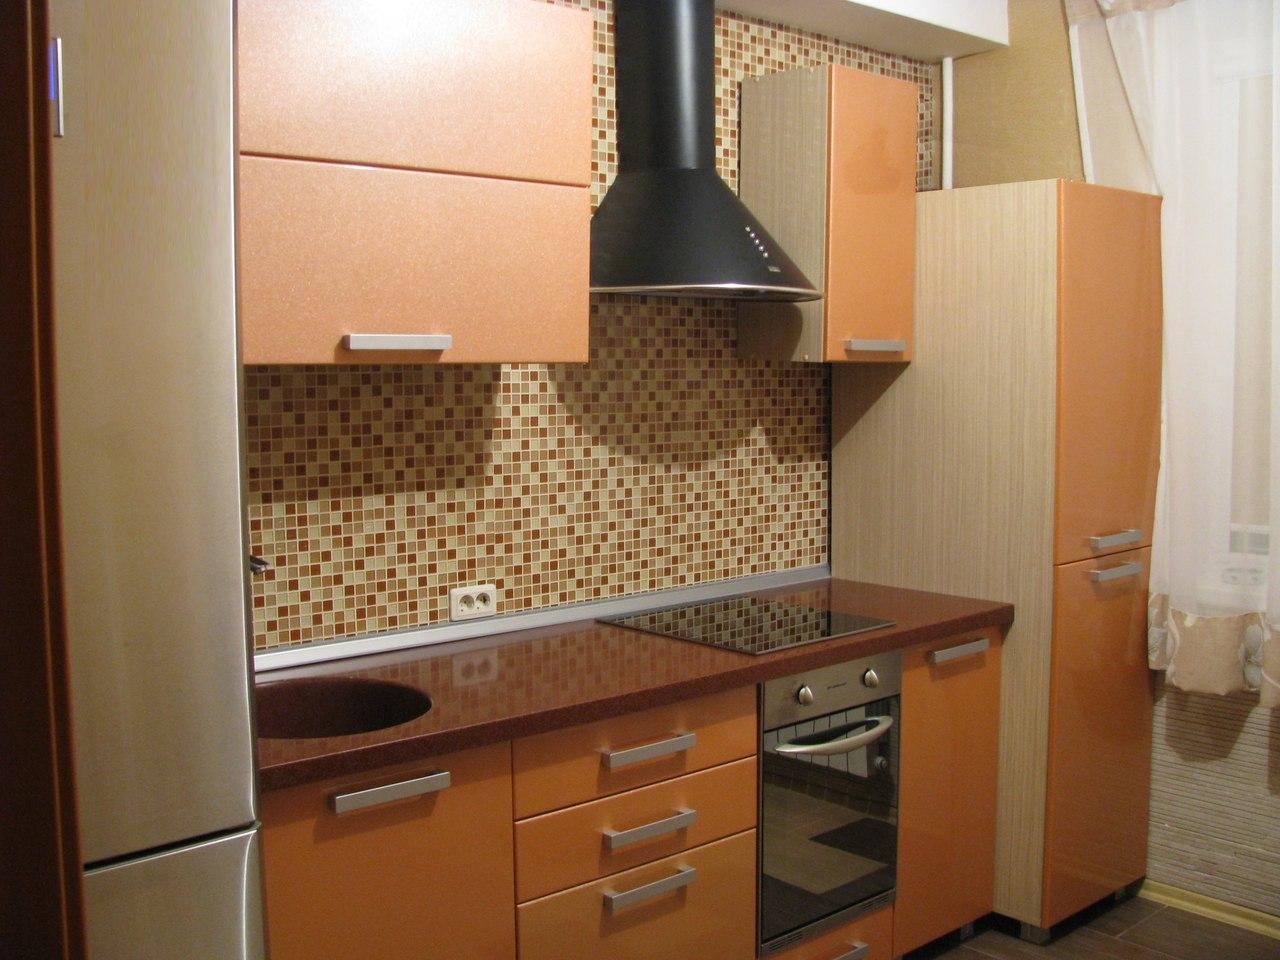 фартук из мозаики на бюджетную кухню